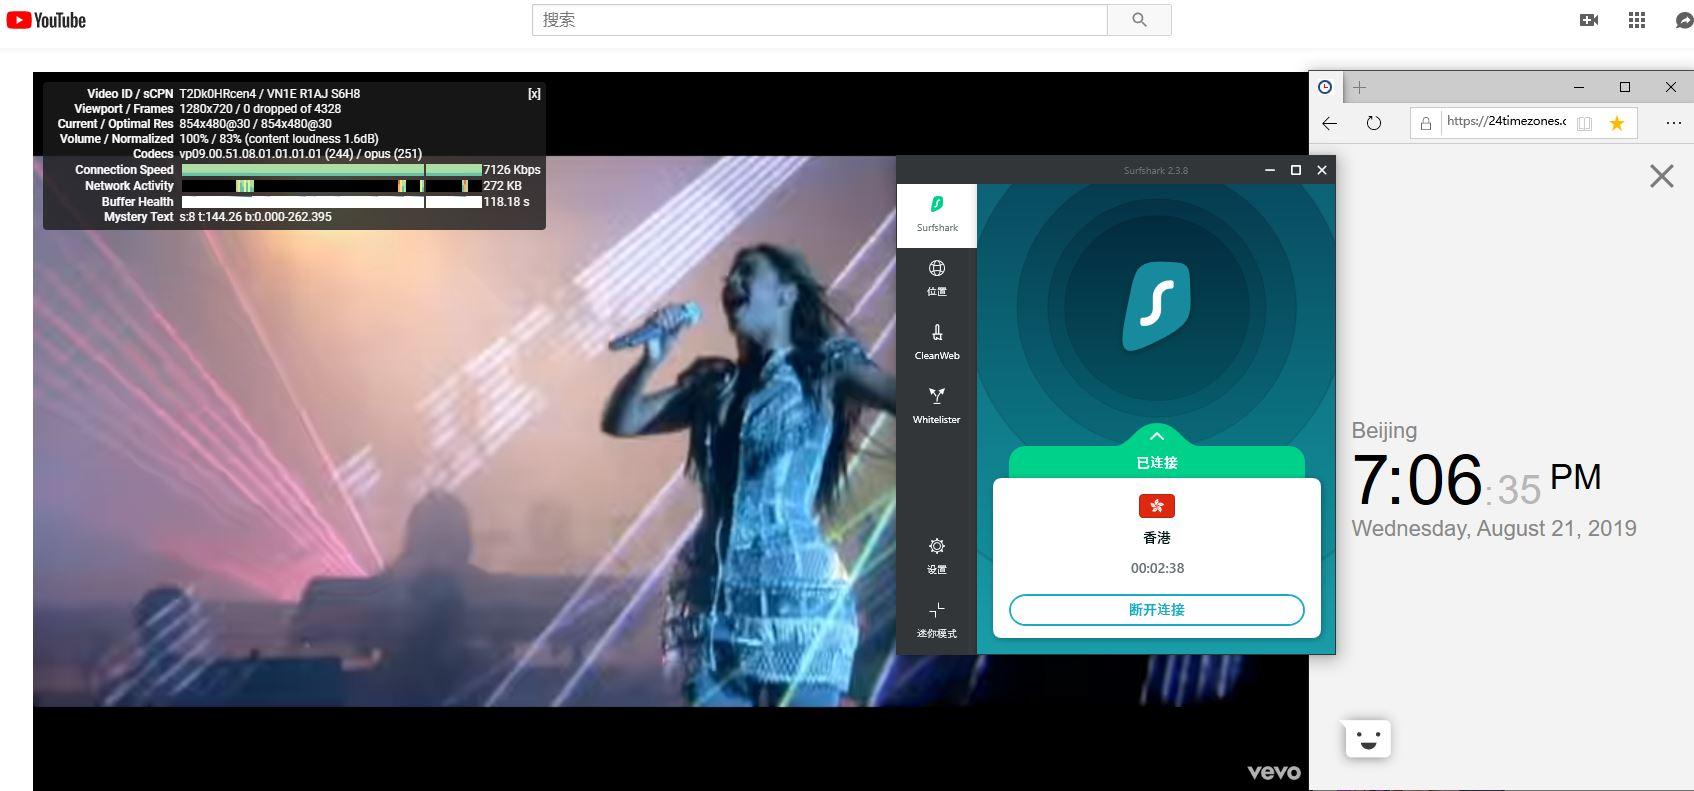 windows surfshark 香港服务器 中国VPN翻墙 科学上网 YouTube测速-20190821